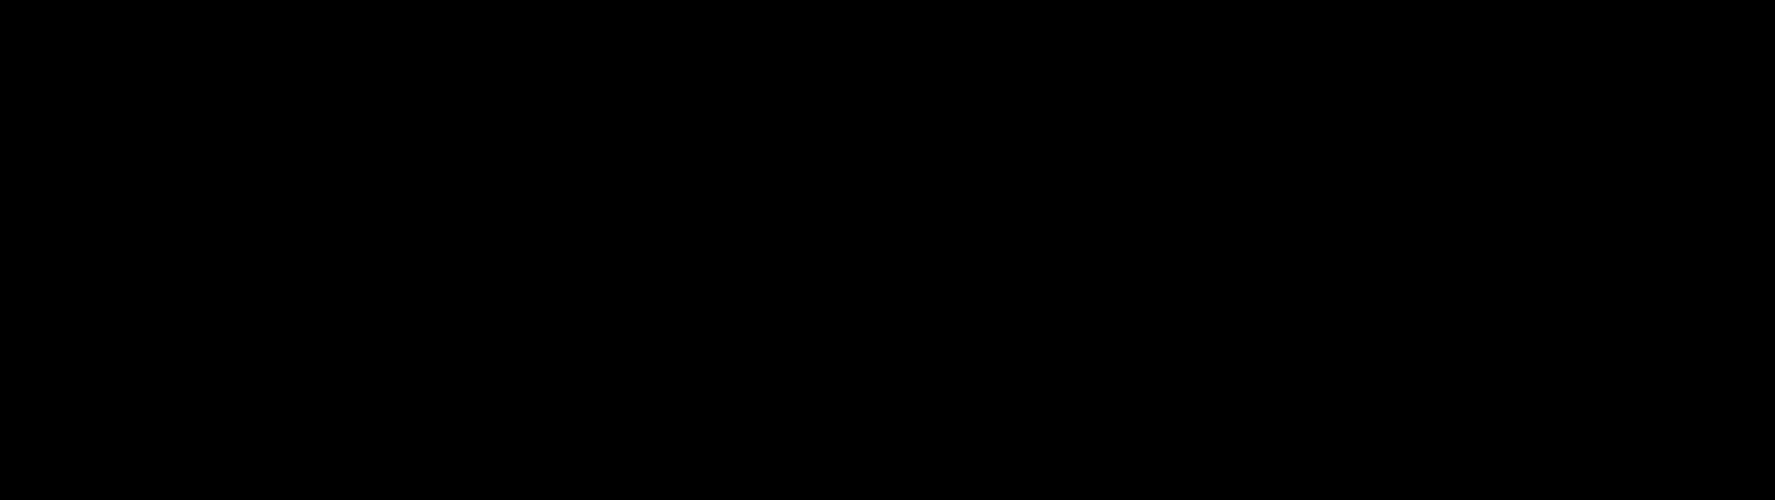 2007-logo-black.png